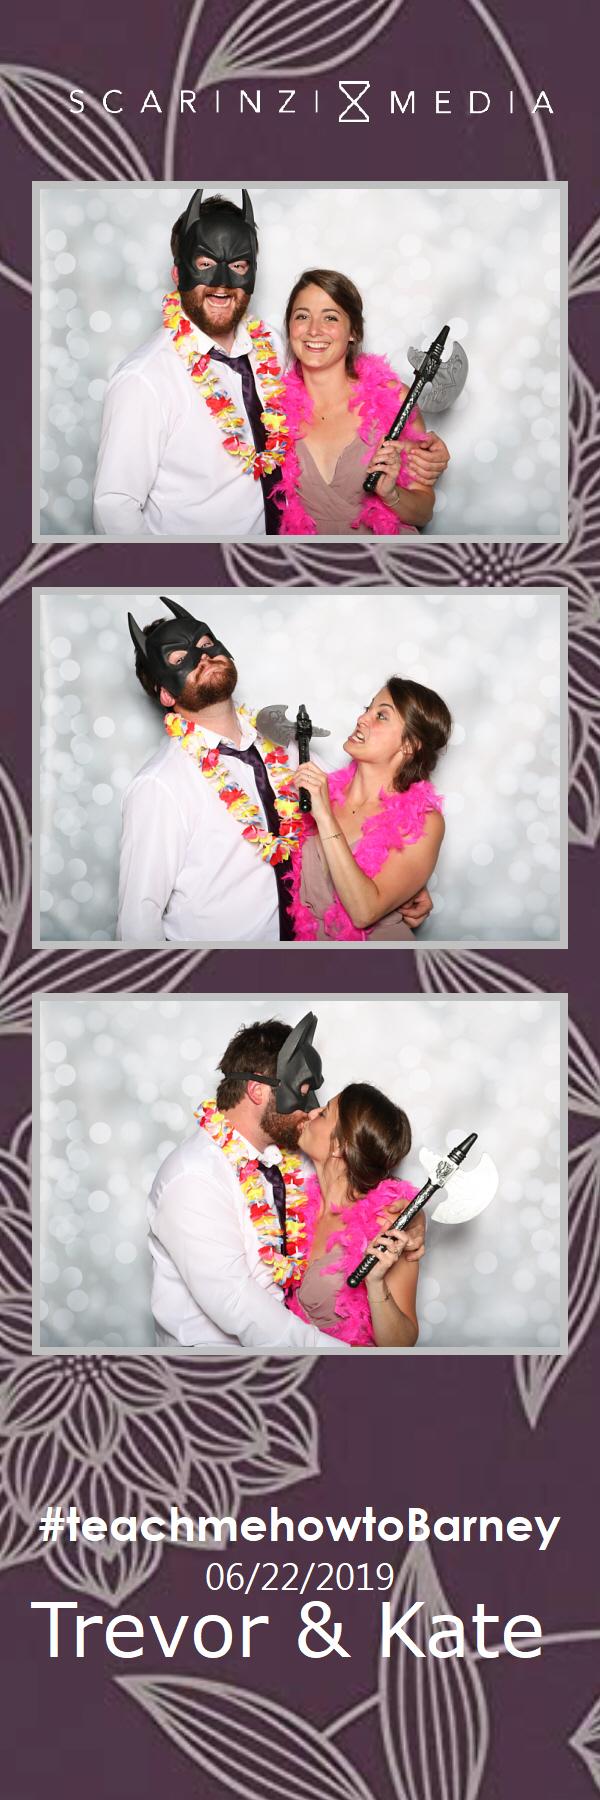 2019.06.22 - Barney Wedding PHOTOBOOTH41.jpg